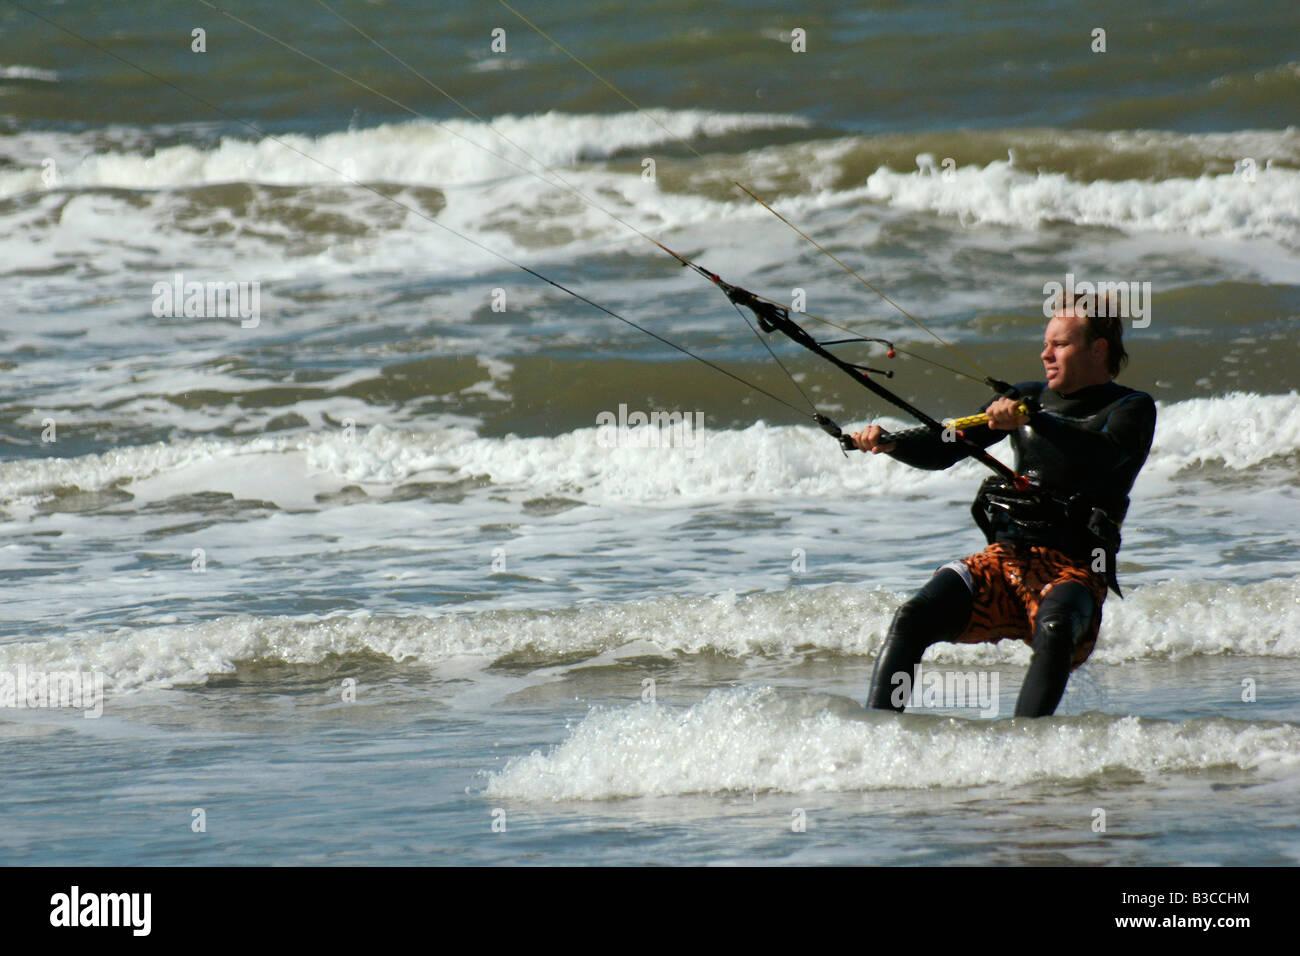 Man in neophrene suit surfing powerkite parafoil in sea high speed at Hoek van Holland, Netherlands - Stock Image